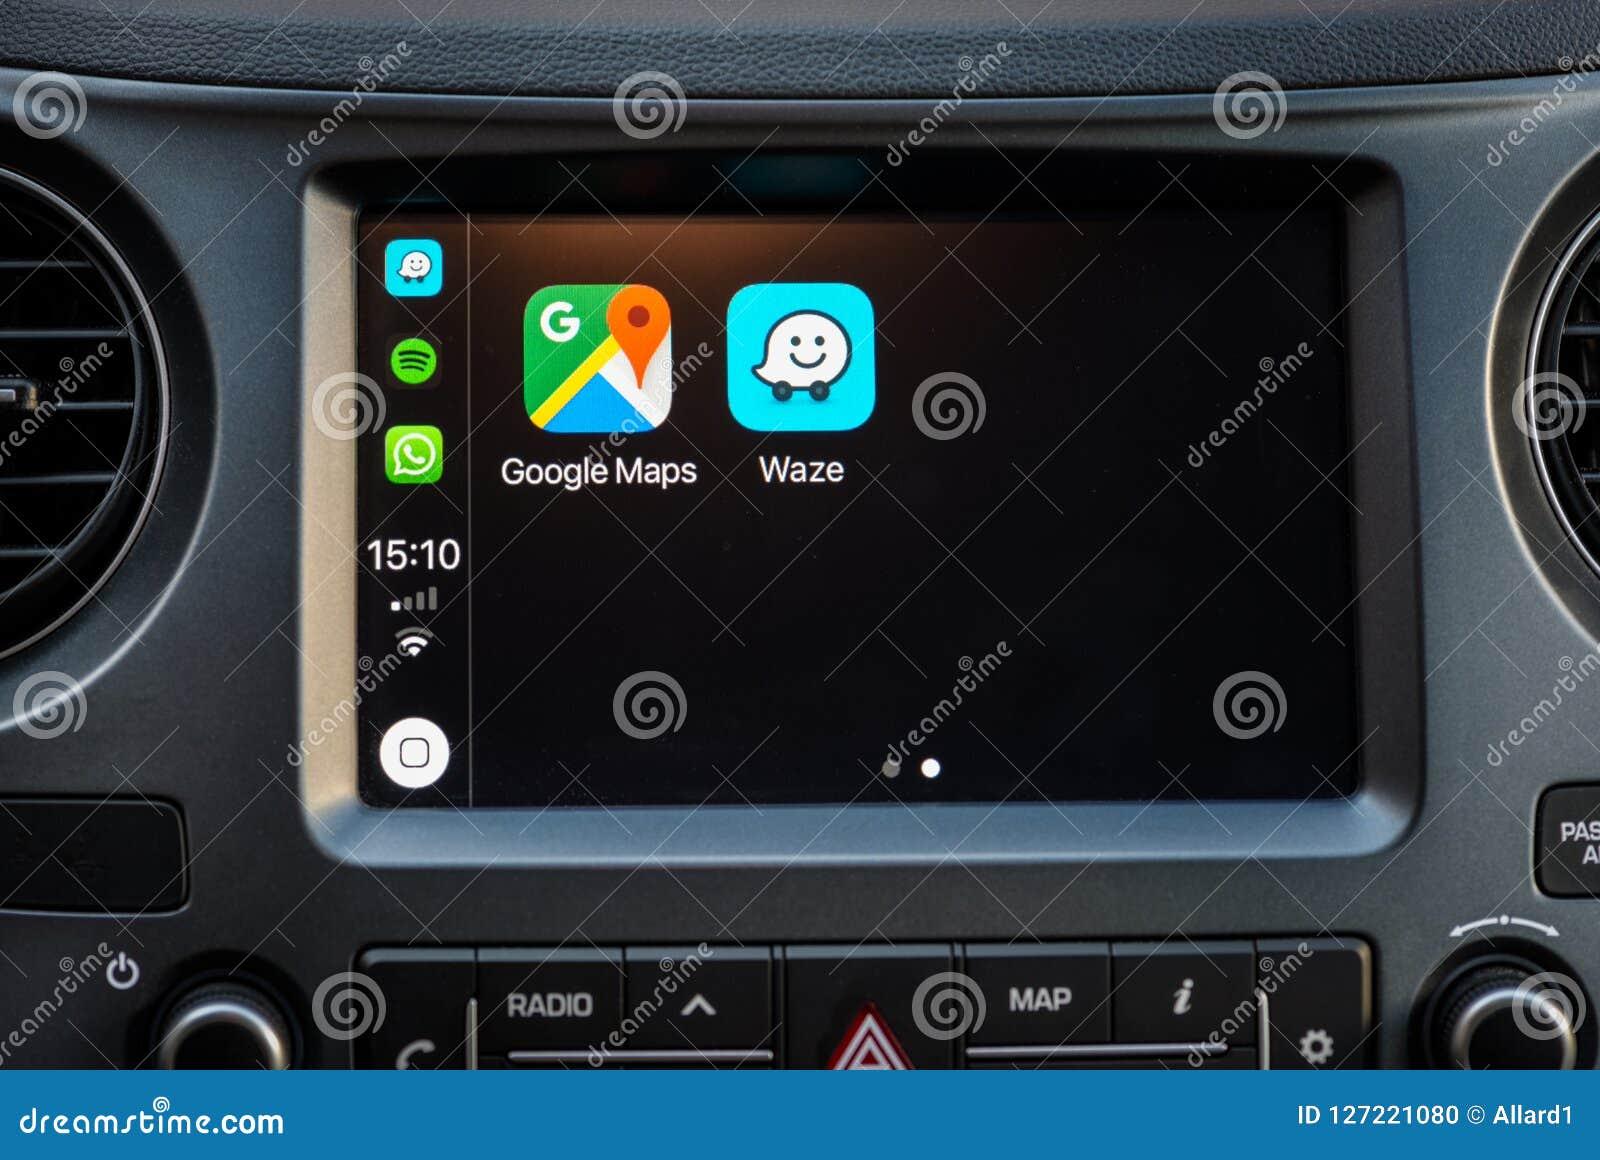 Apple Carplay Screen In Car Dashboard Displaying Google Maps And